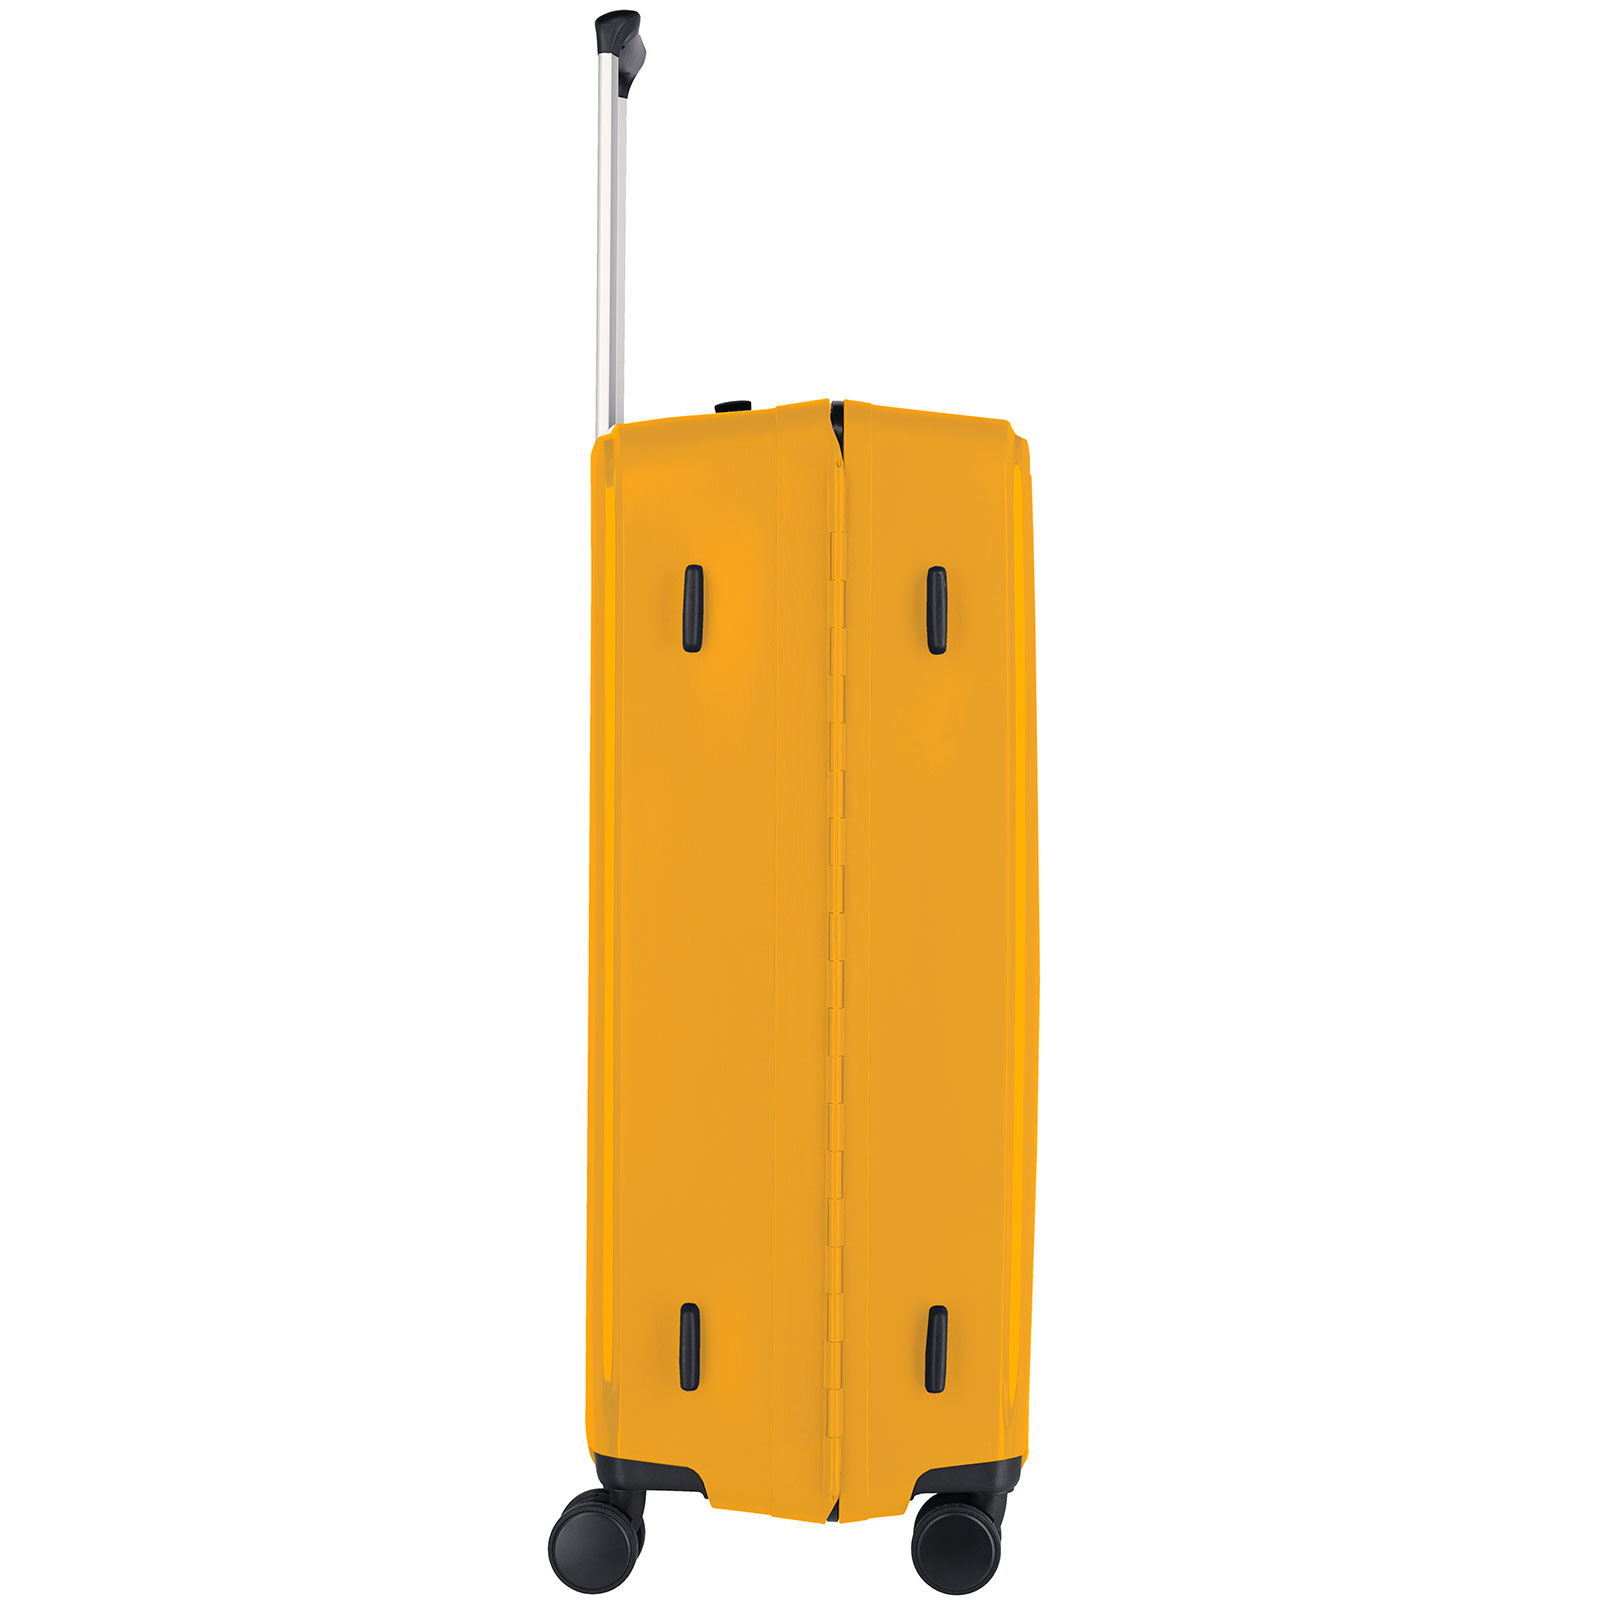 Travelite Terminal Spinner 76 cm grote maat koffer - Yellow - harde koffer zonder rits